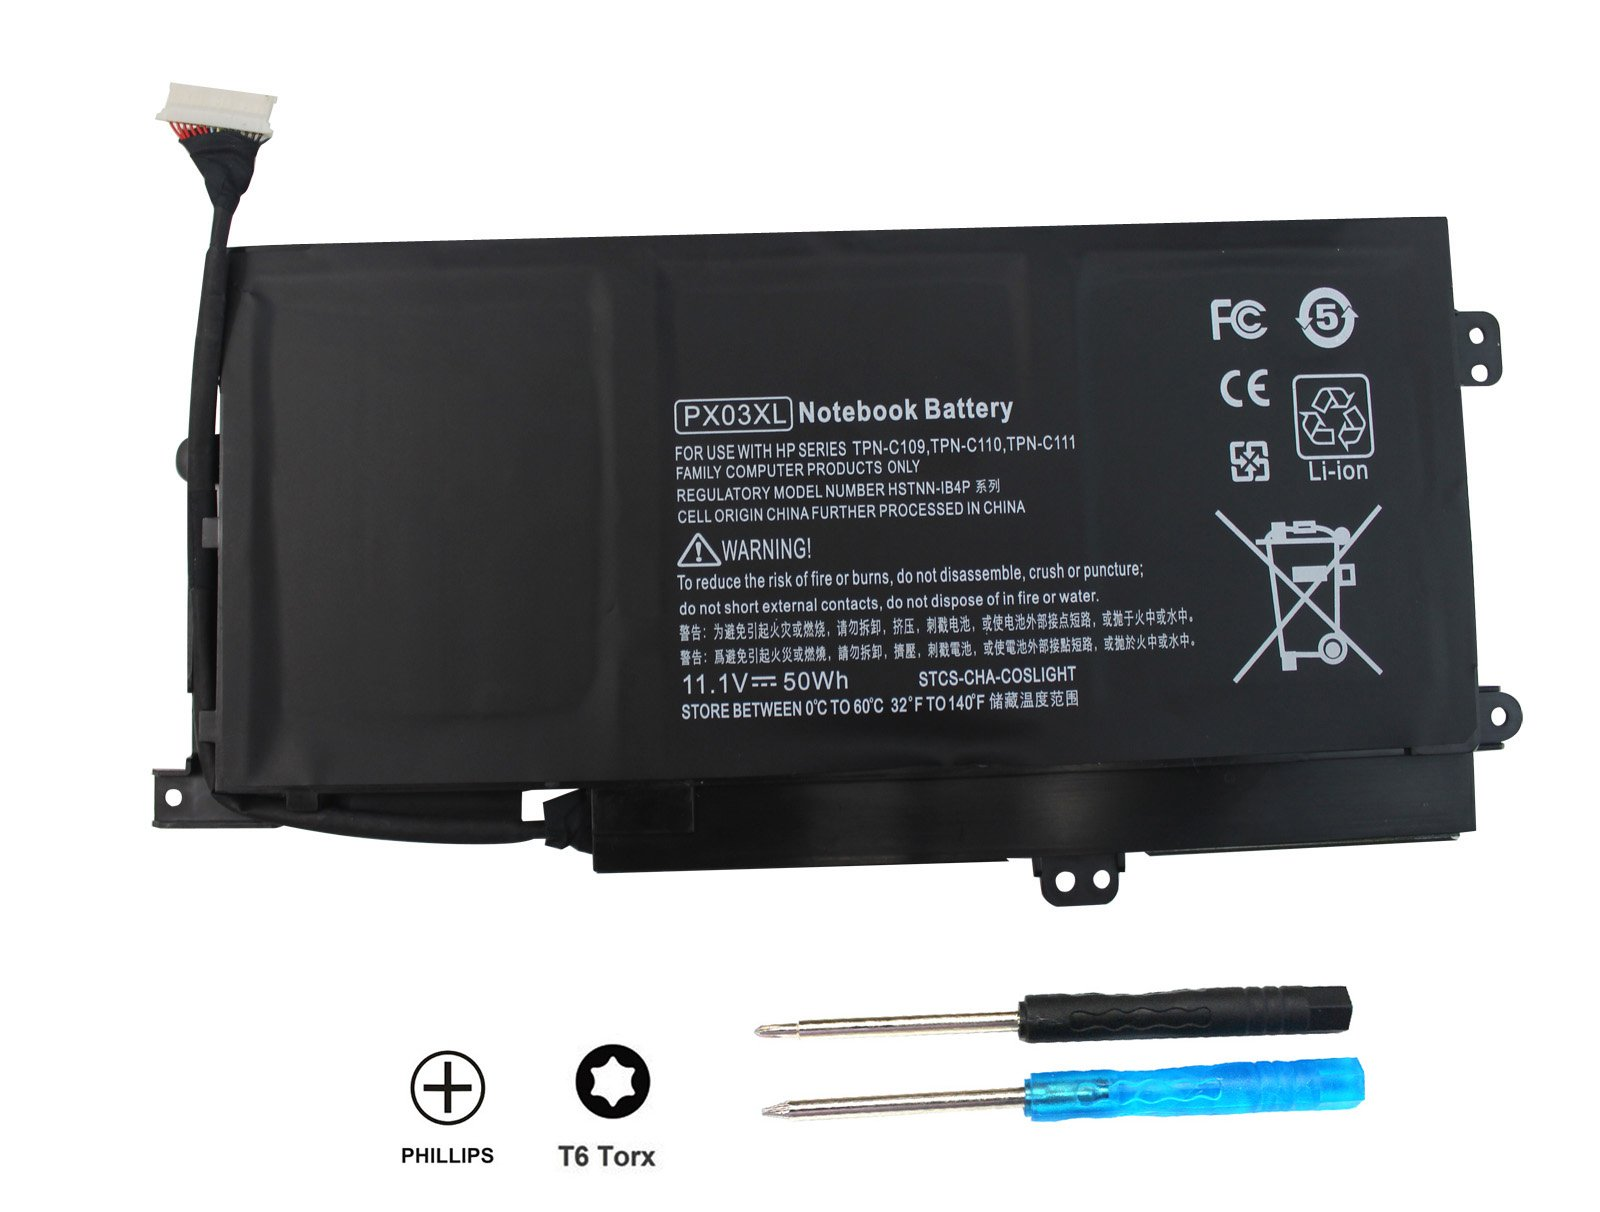 SKY BOY PX03XL Compatible HP Laptop Battery Envy 14 Touchsmart M6 M6-K K002TX K022DX M6-K122DX M6-K125DX M6-K025DX M6-K010DX M6-K012DX M6-K015DX M6-K022DX M6-K015DX 715050-001 TPN-C109 C110 C111